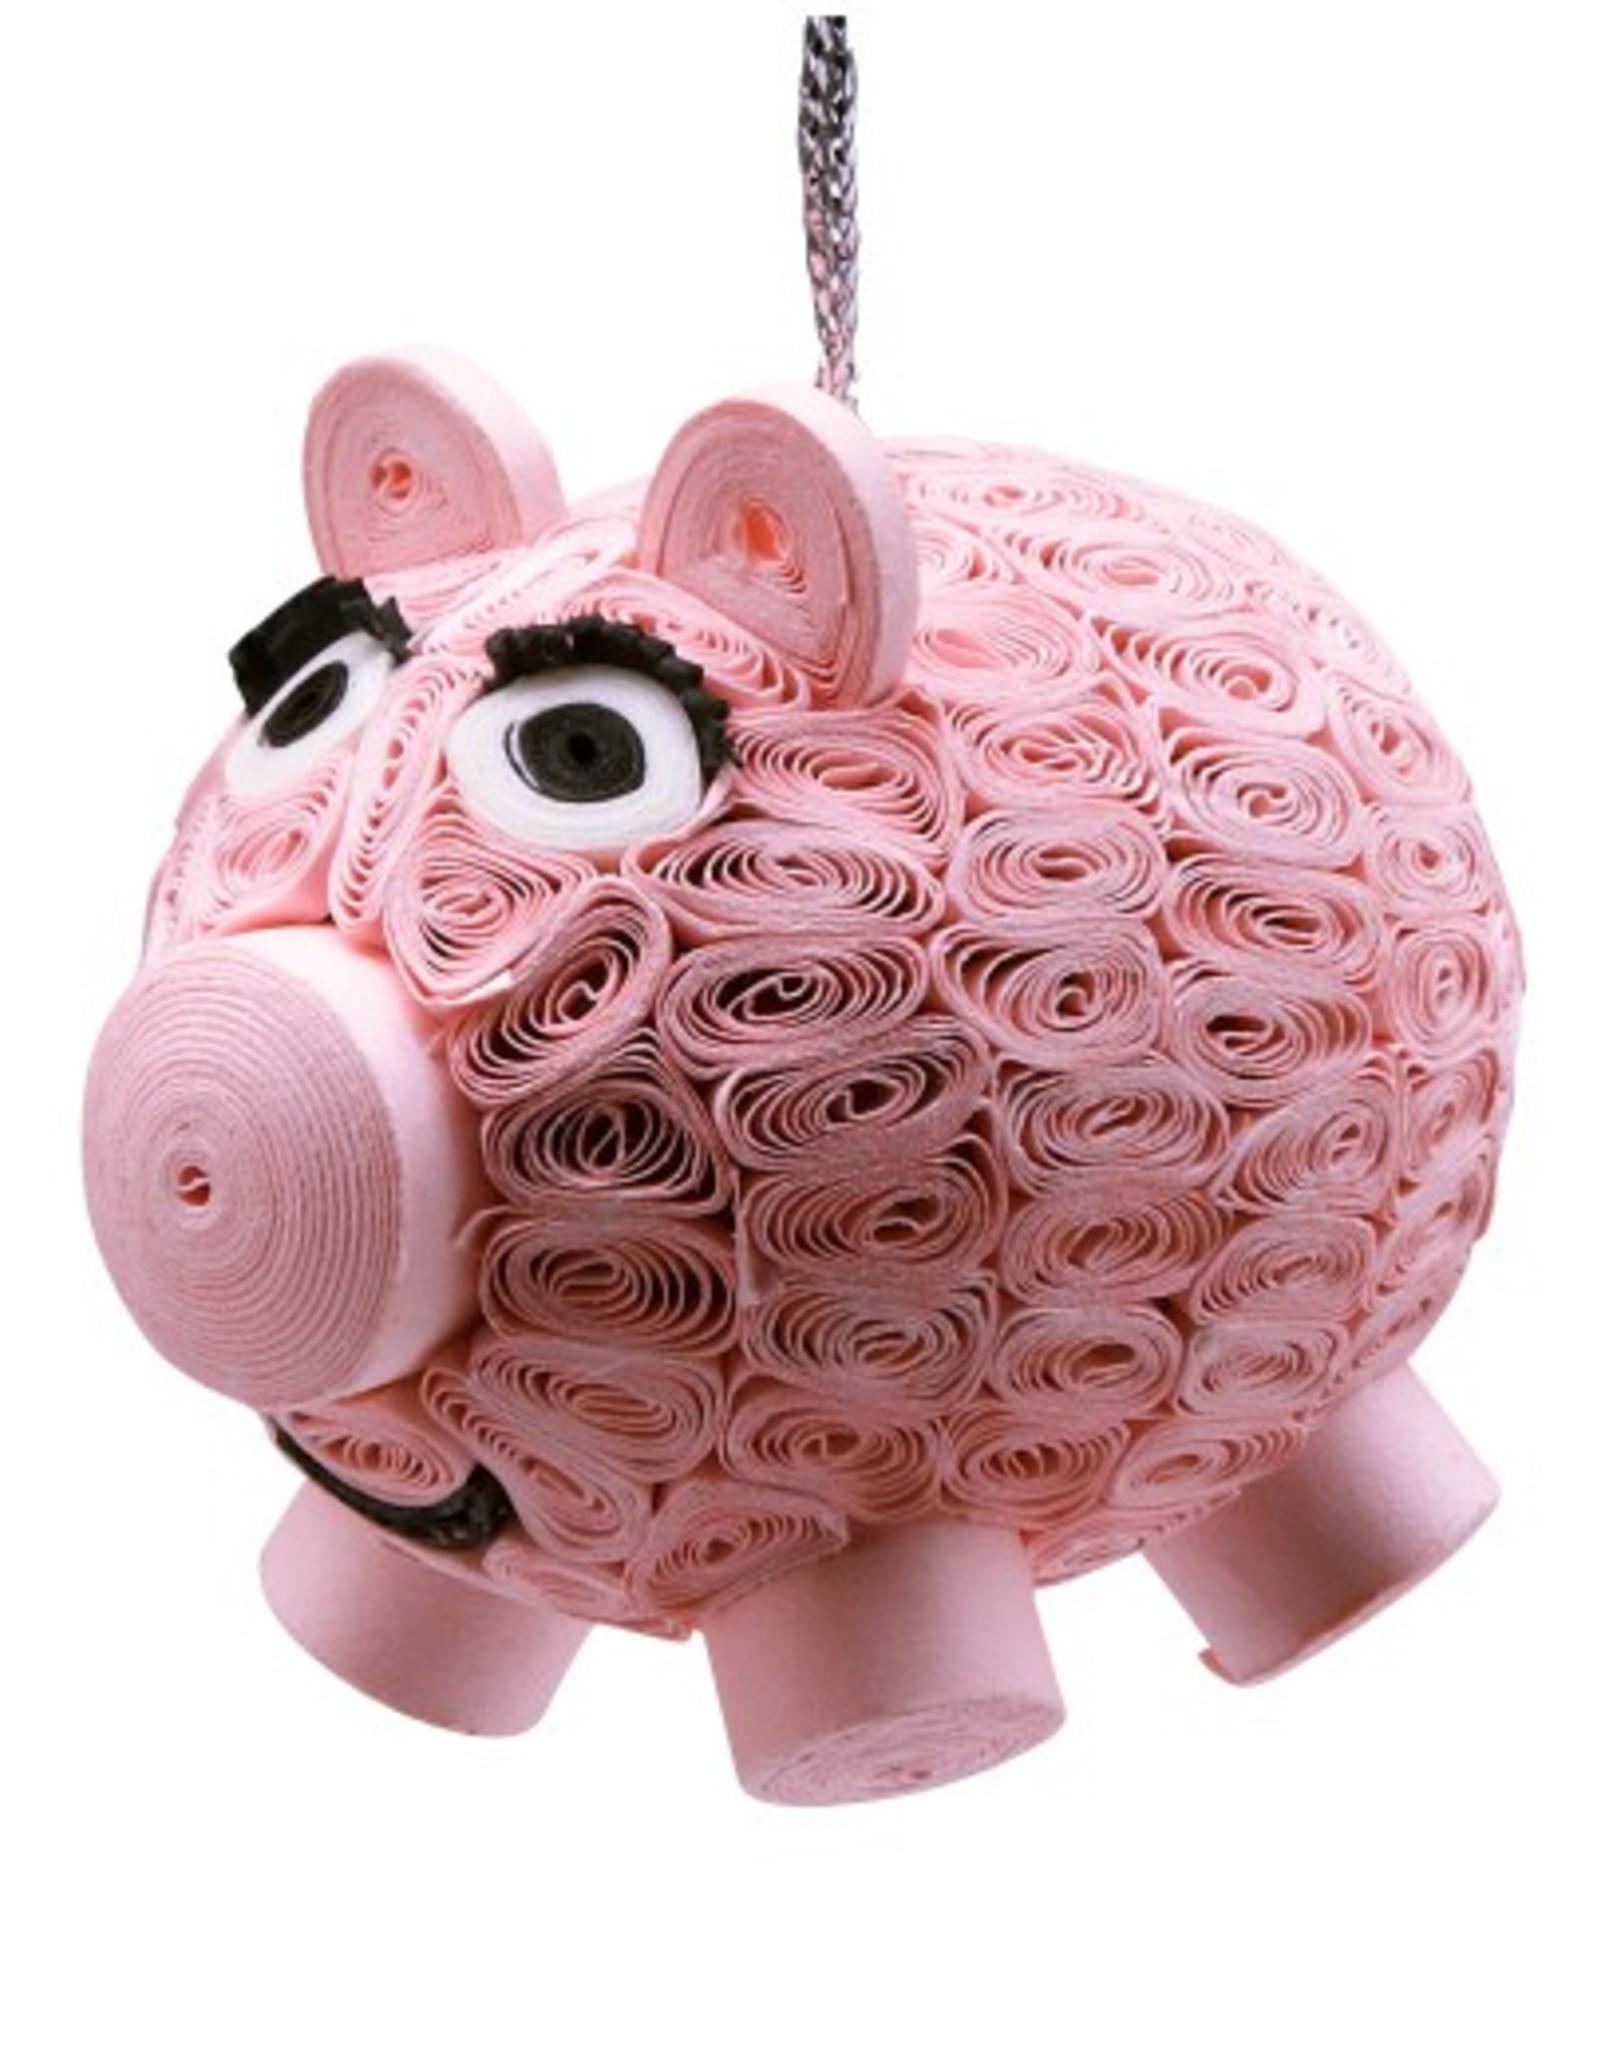 Vietnam, Quilled Ornament Pig